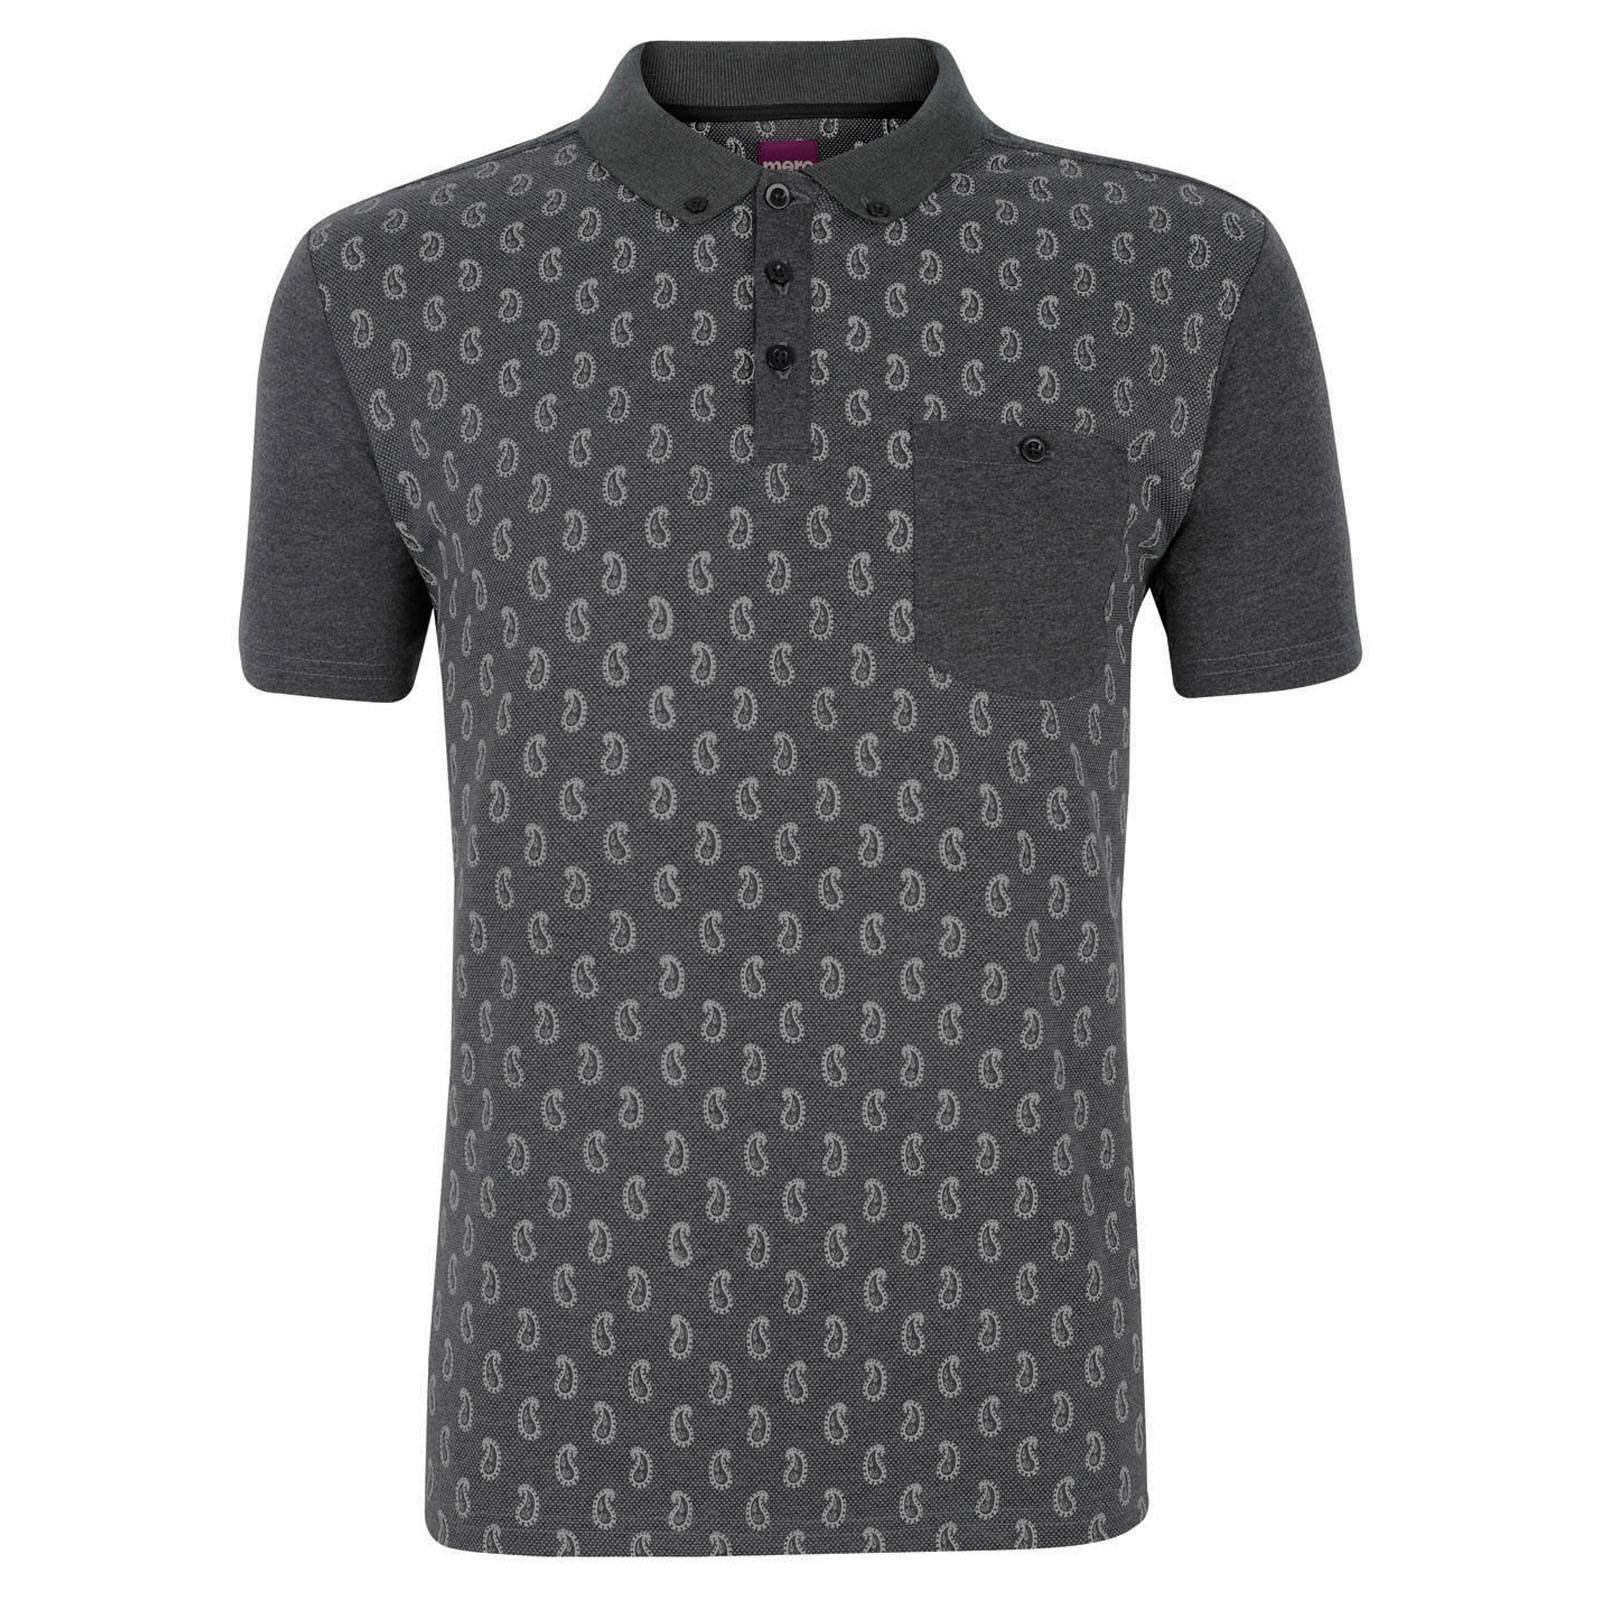 Рубашка Поло BanionПоло<br><br><br>Артикул: 1913203<br>Материал: 100% хлопок<br>Цвет: серый<br>Пол: Мужской